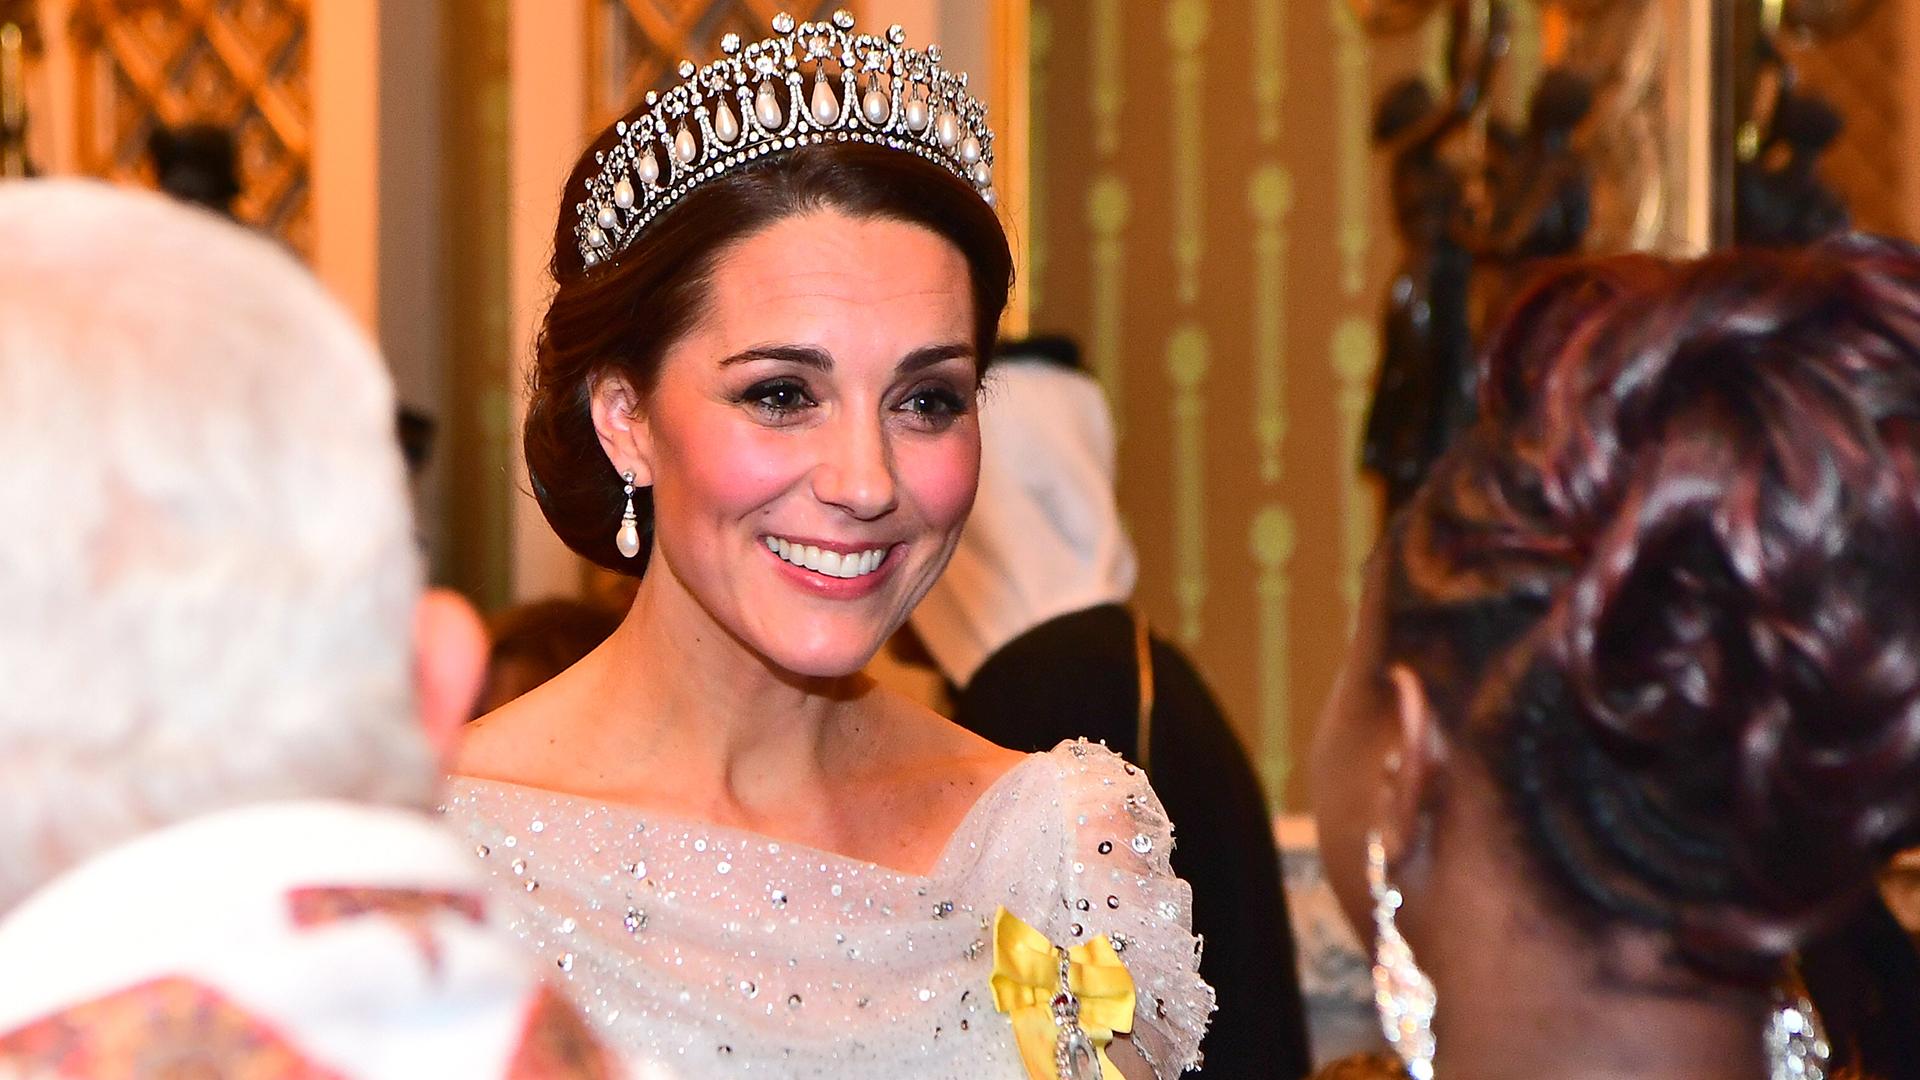 La llegada de Catalina, duquesa de Cambridge, esposa del príncipe Guillermo